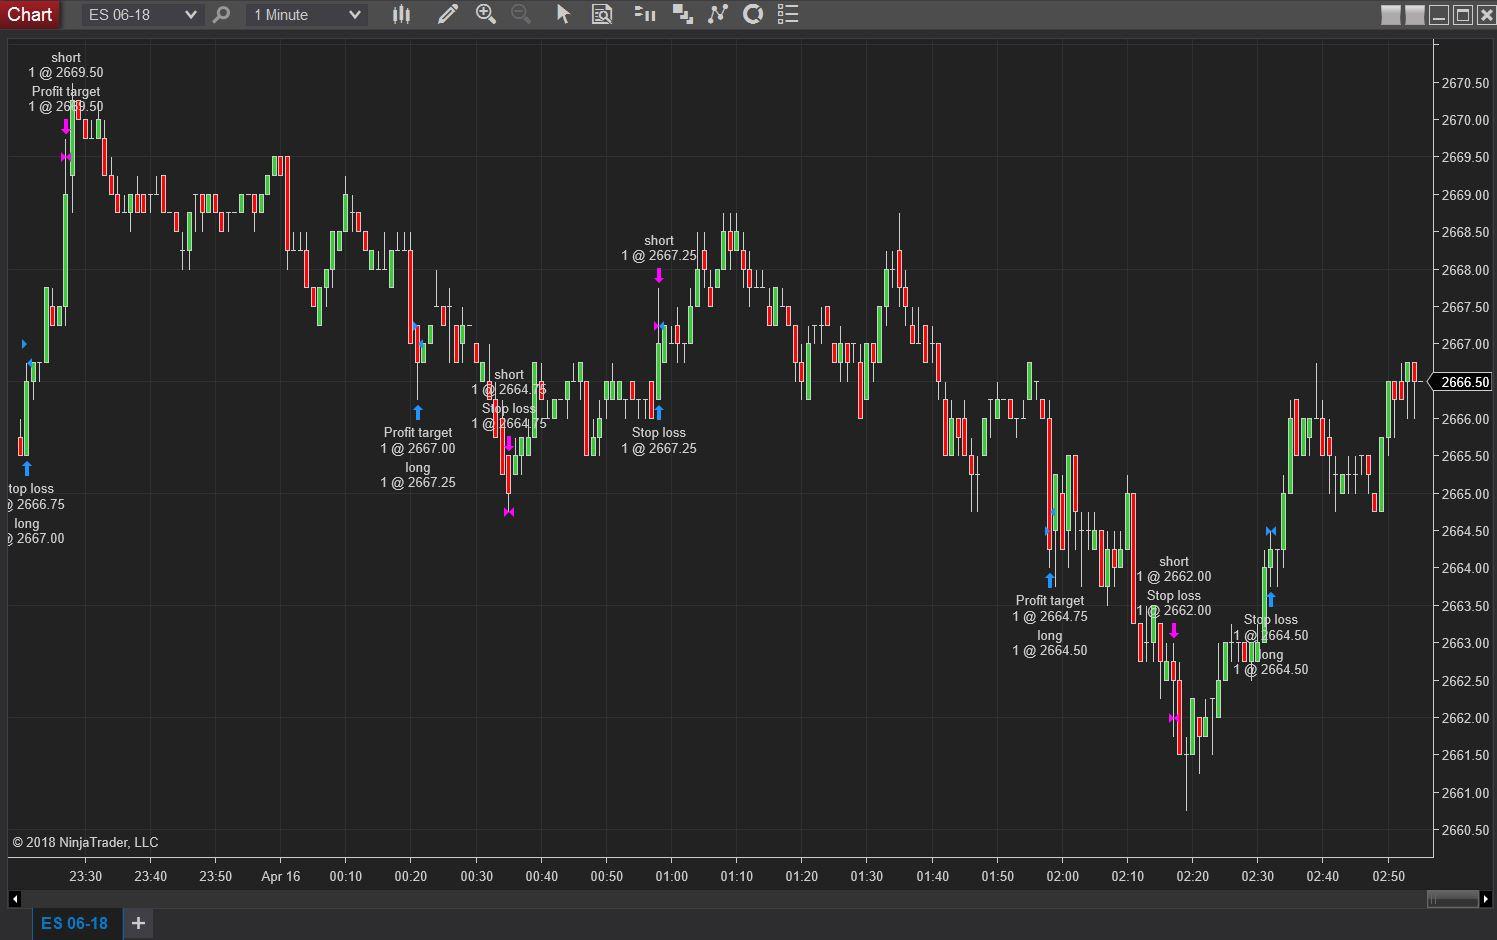 Daily Loss/Profit Limit